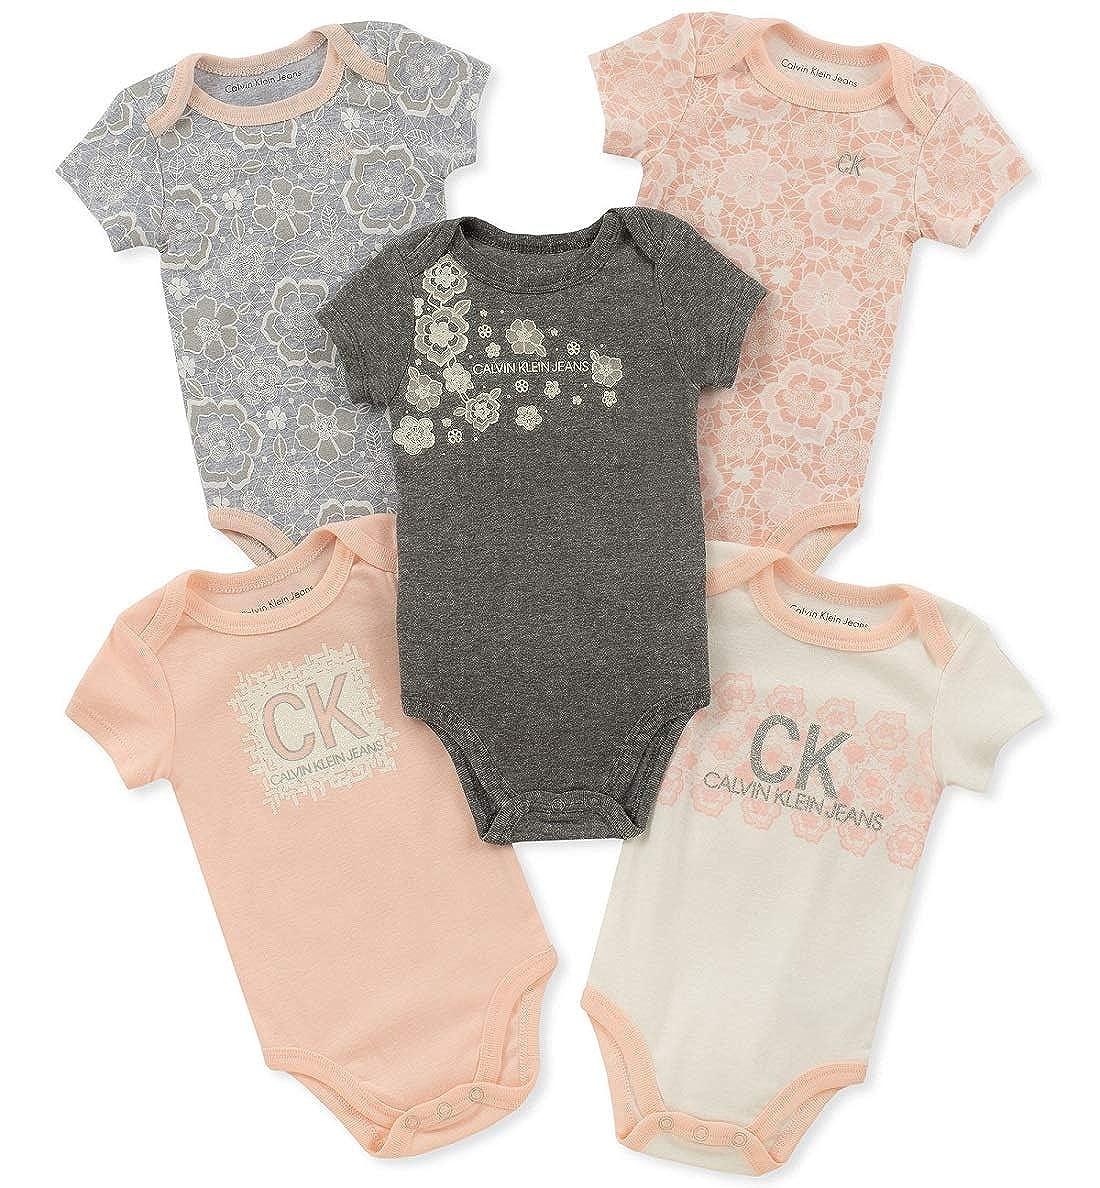 【GINGER掲載商品】 Calvin Calvin Klein Jeans 9 PANTS ベビーガールズ 6 - 9 Months Pink/Brown/Vanilla Pink/Brown/Vanilla B079MQT9L5, 鶴が丘米店:e71cb8a5 --- a0267596.xsph.ru